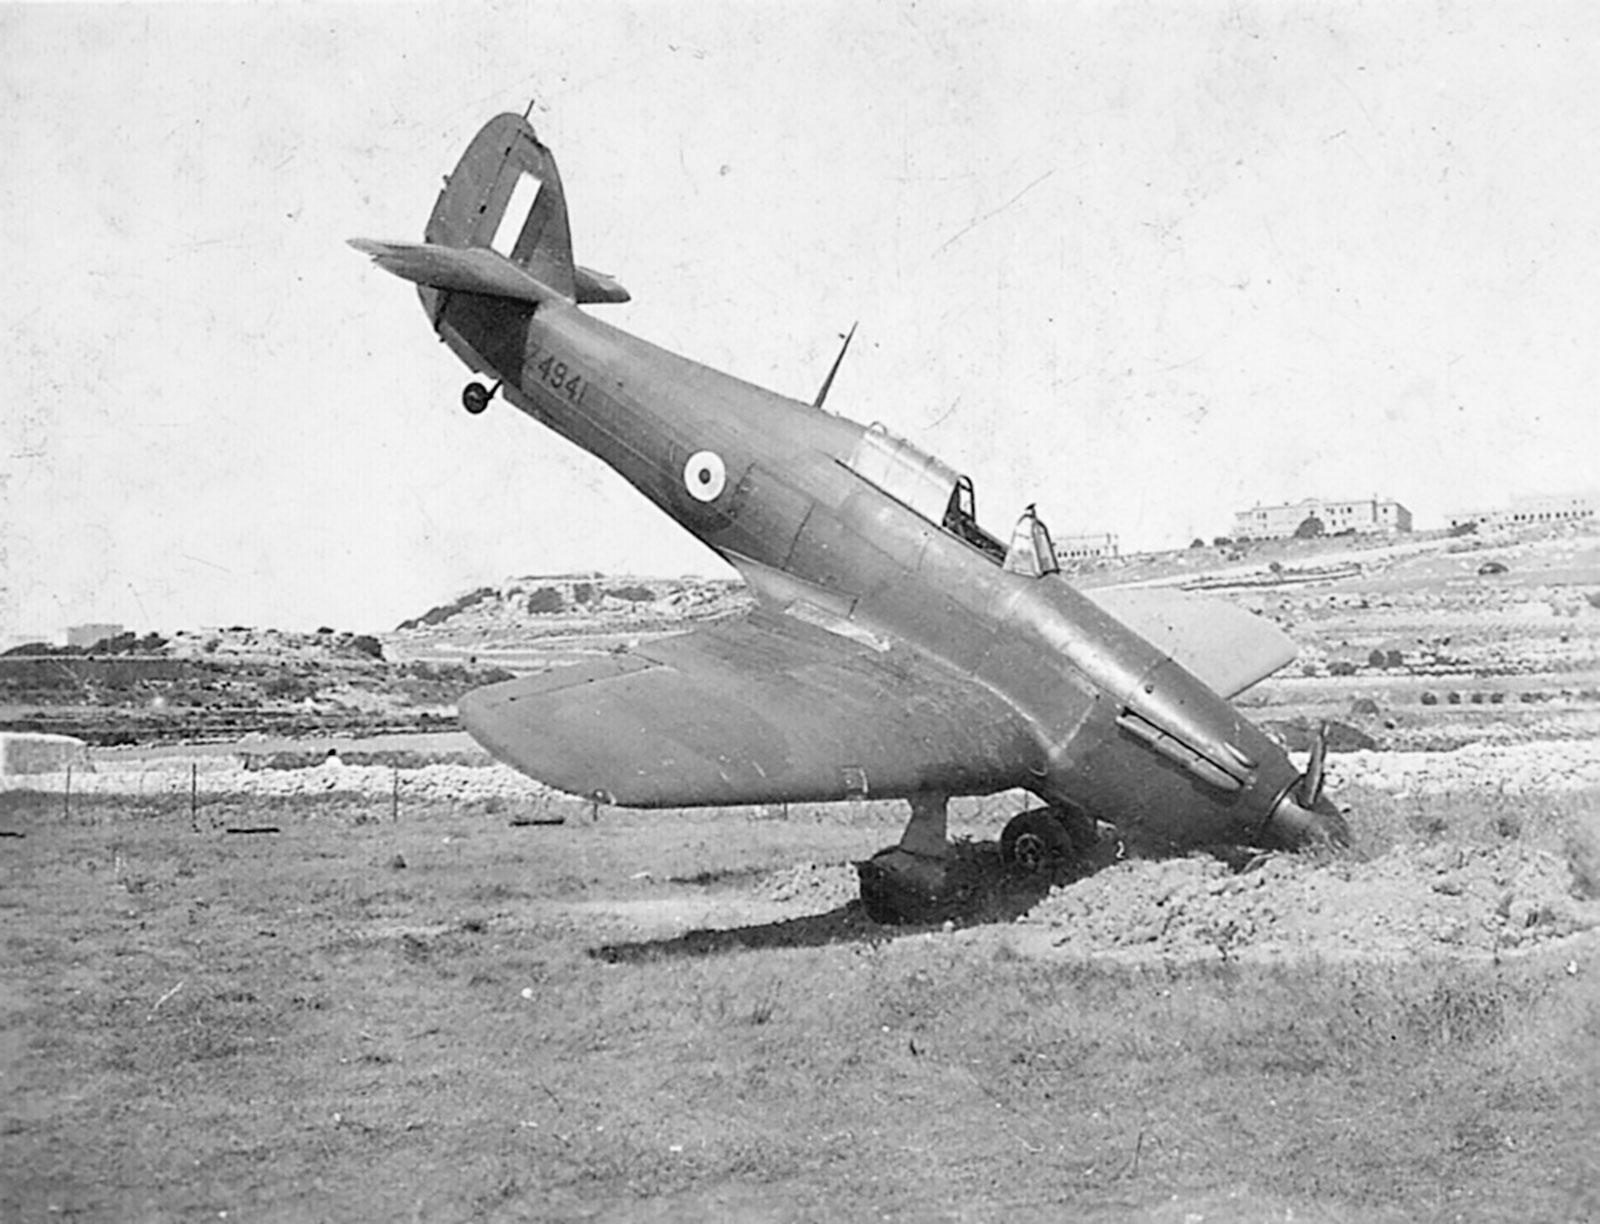 Hawker Hurricane IIb RAF Z4941 taxied into a bomb crater in Malta 01